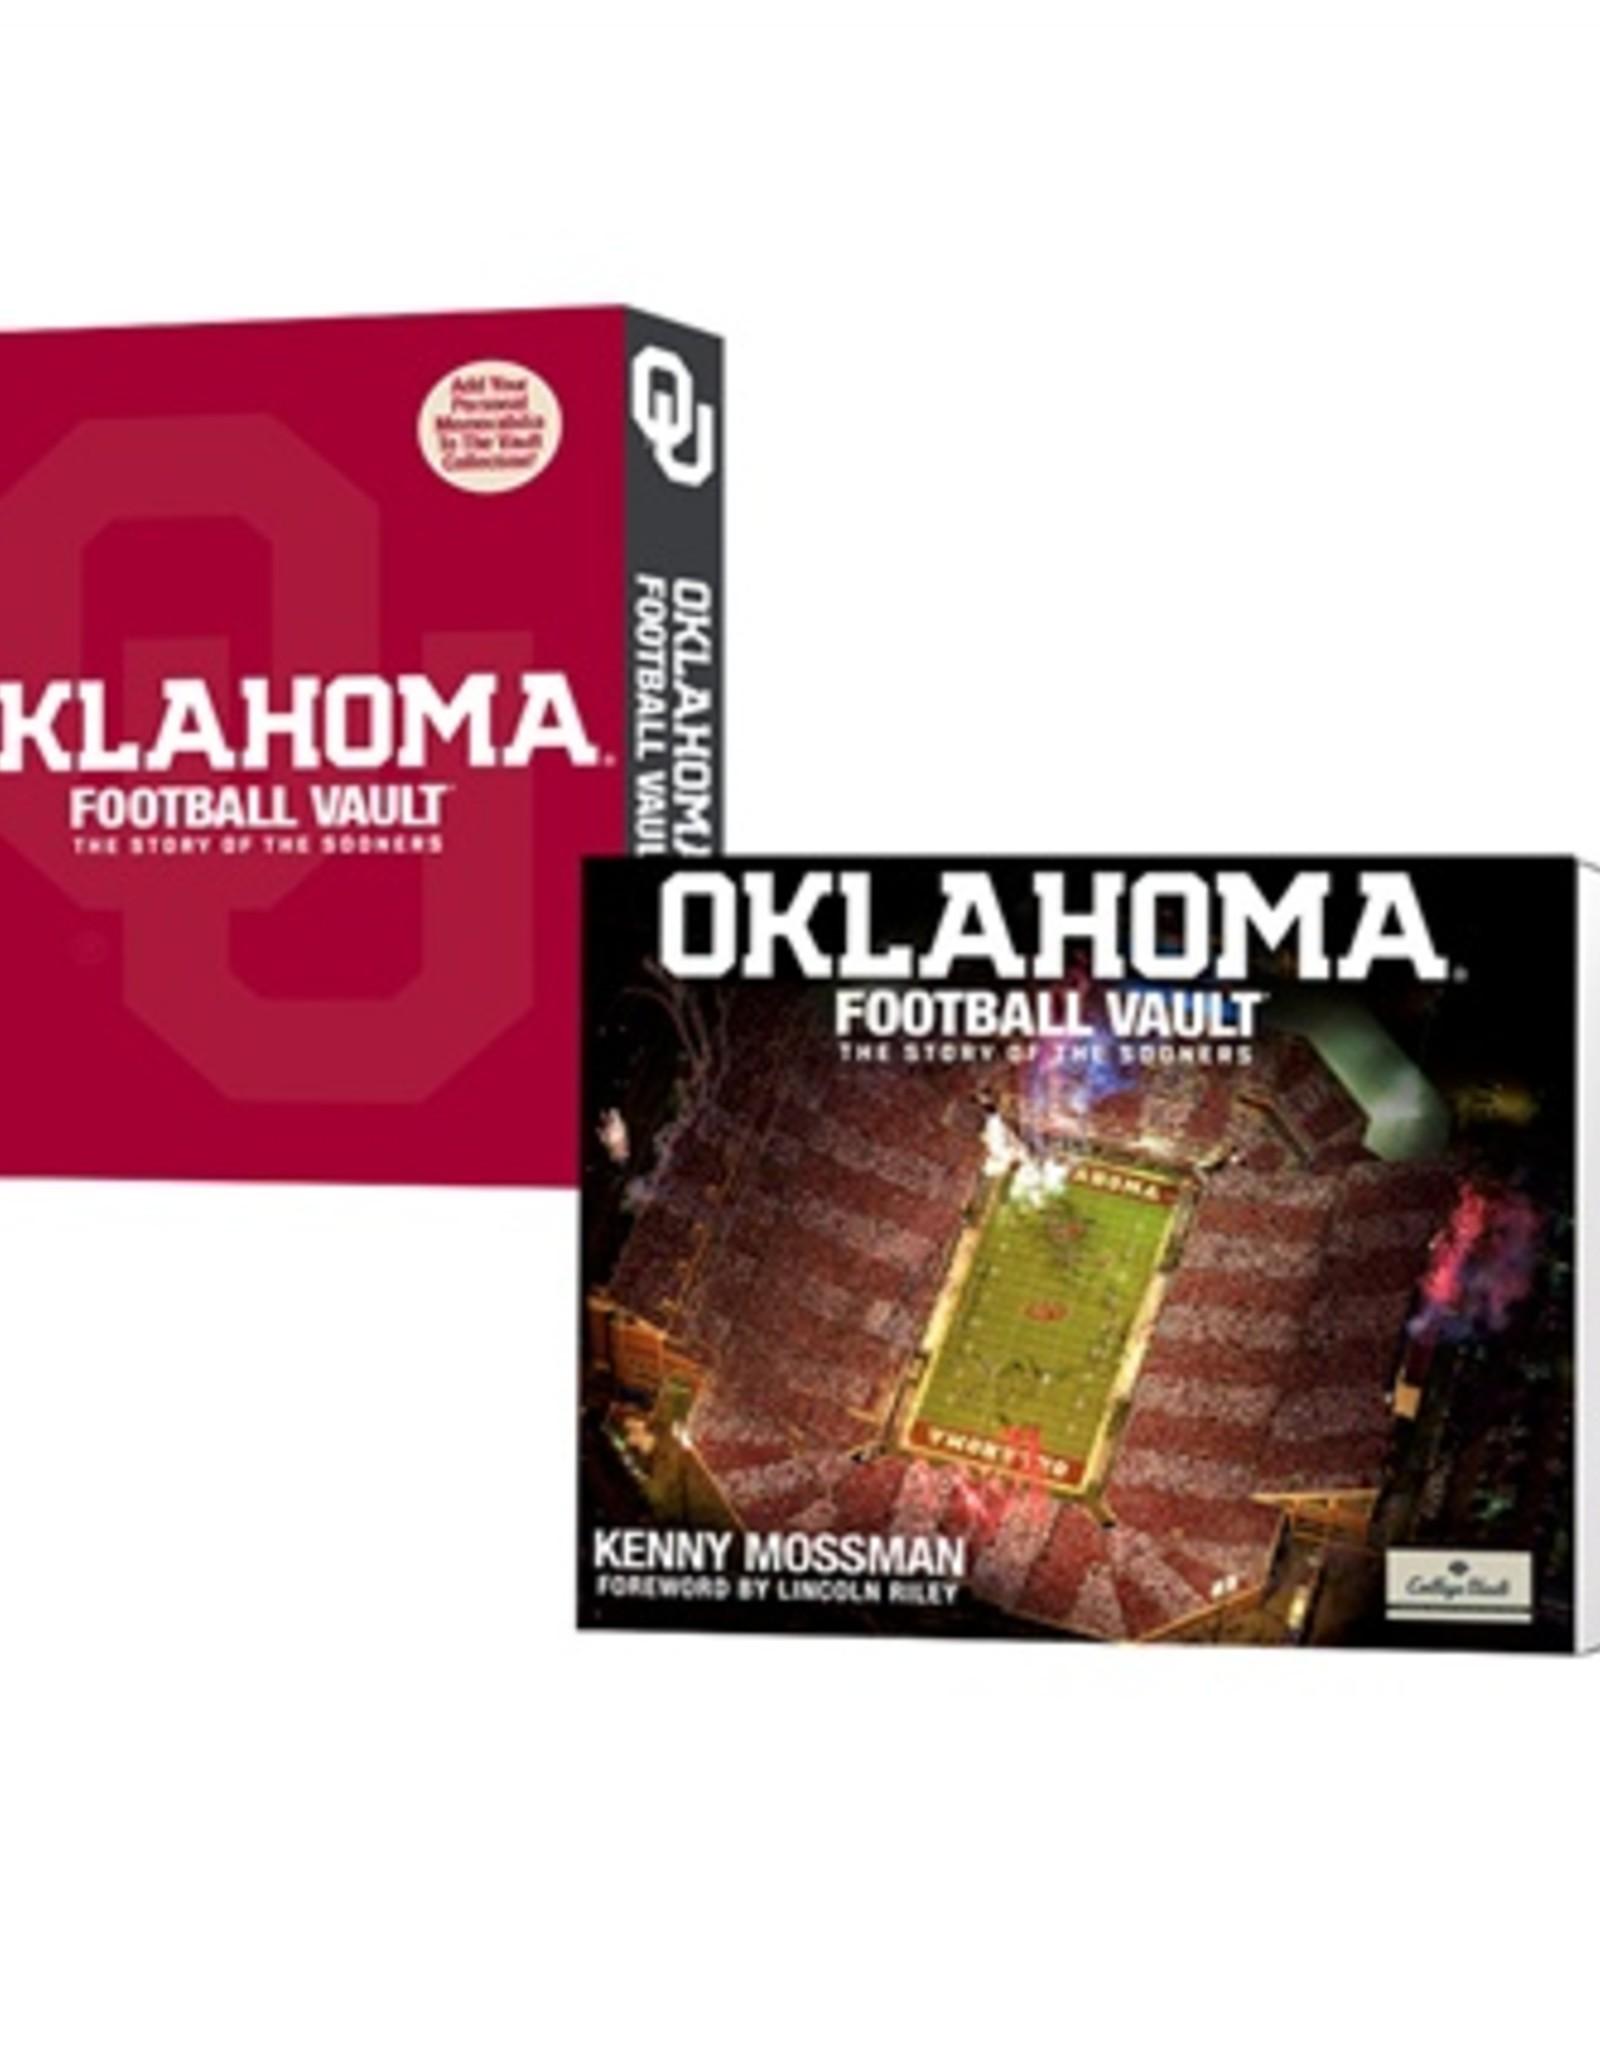 Whitman Oklahoma Football Vault Book by Kenny Mossman